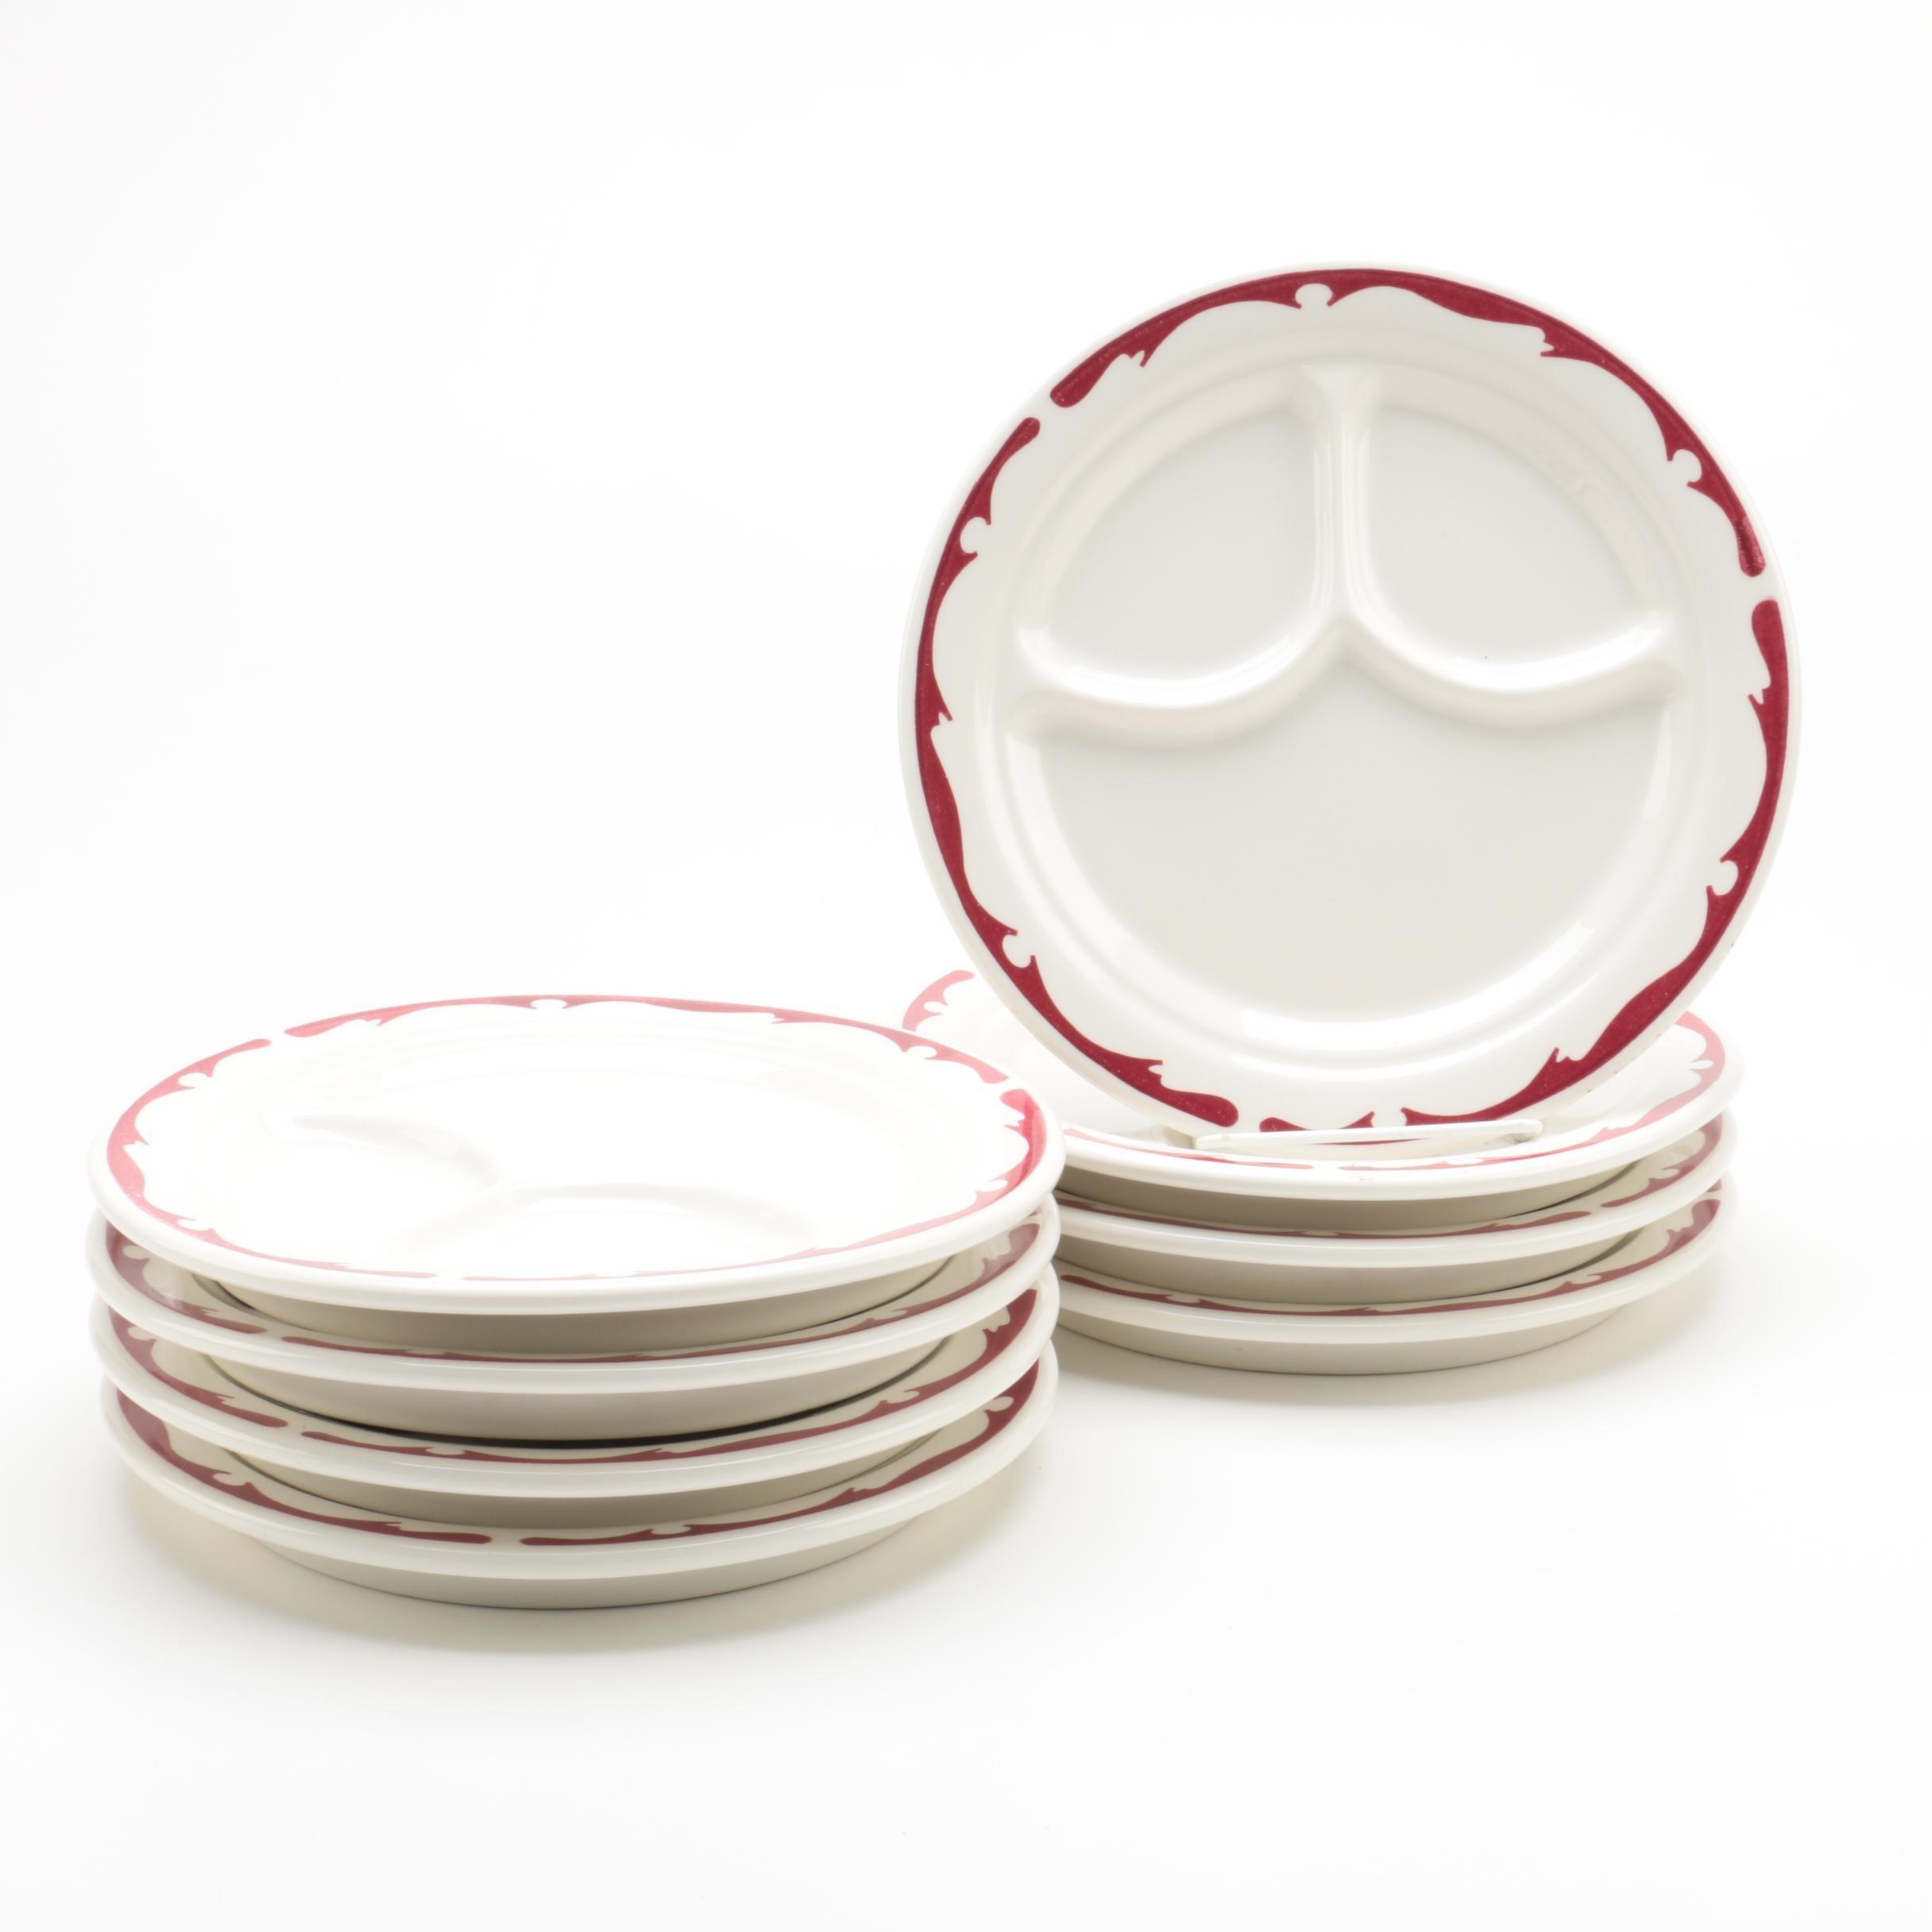 Vintage Buffalo Pottery Divided Dinner Plates with Red Crest Border 1950s ...  sc 1 st  EBTH.com & Vintage Buffalo Pottery Divided Dinner Plates with Red Crest Border ...